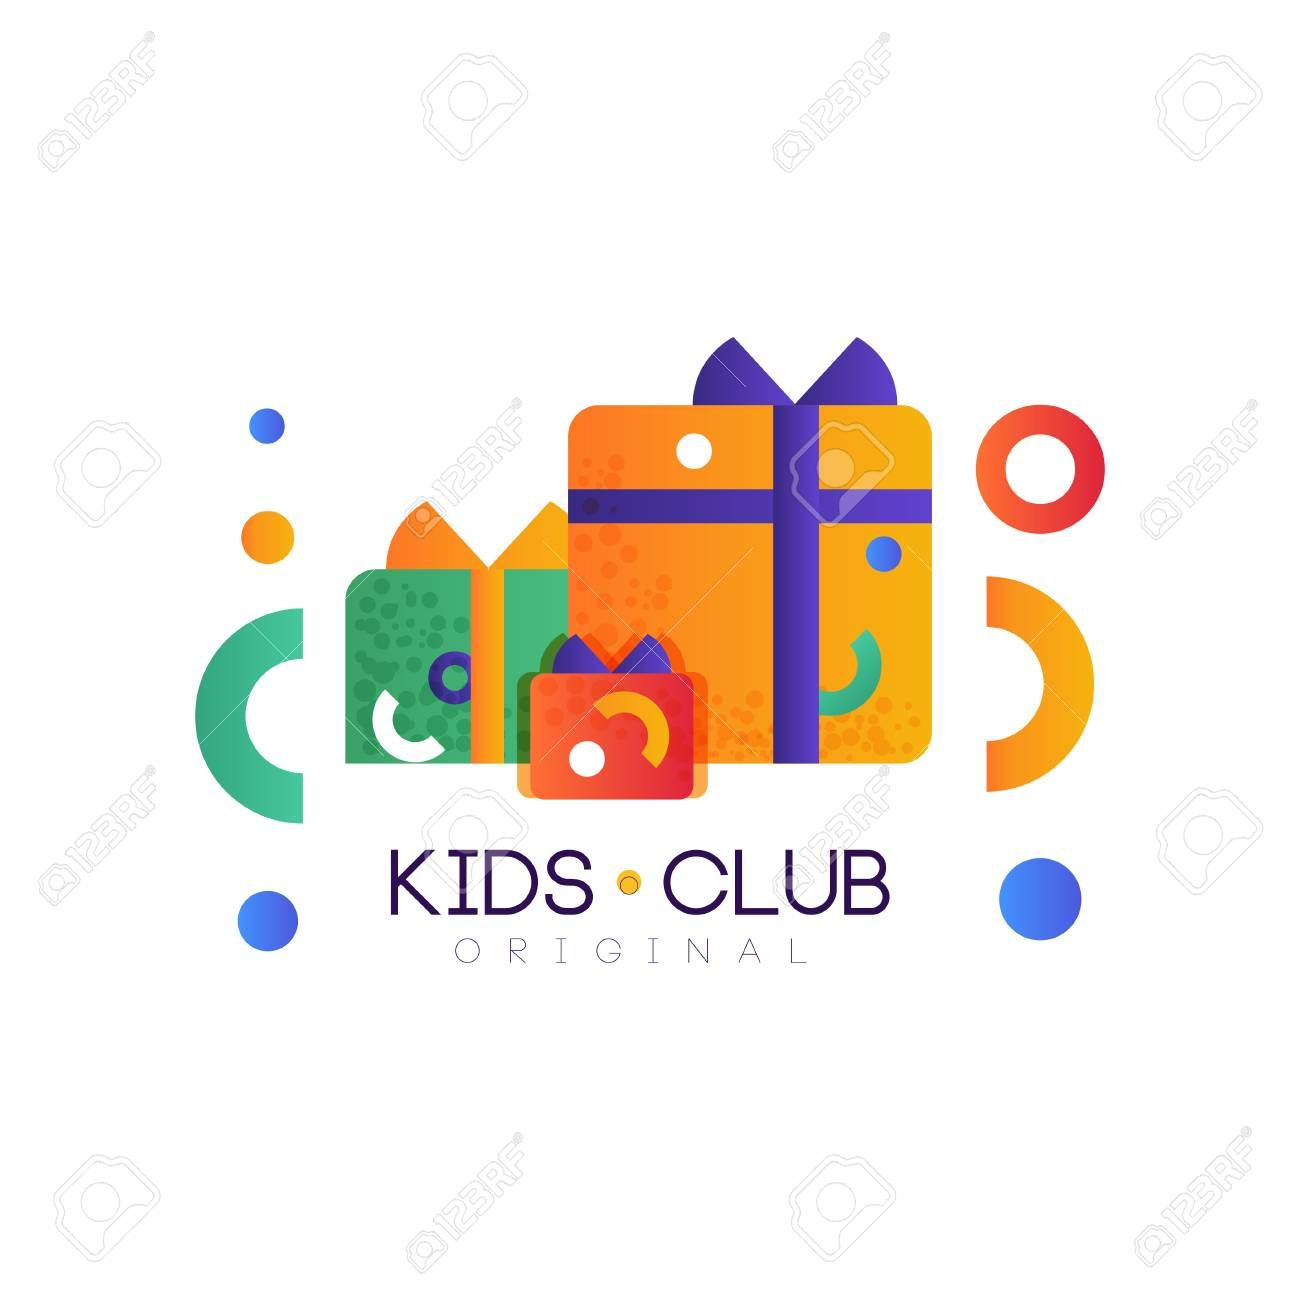 Kids Club Original Colorful Creative Label Template Playground